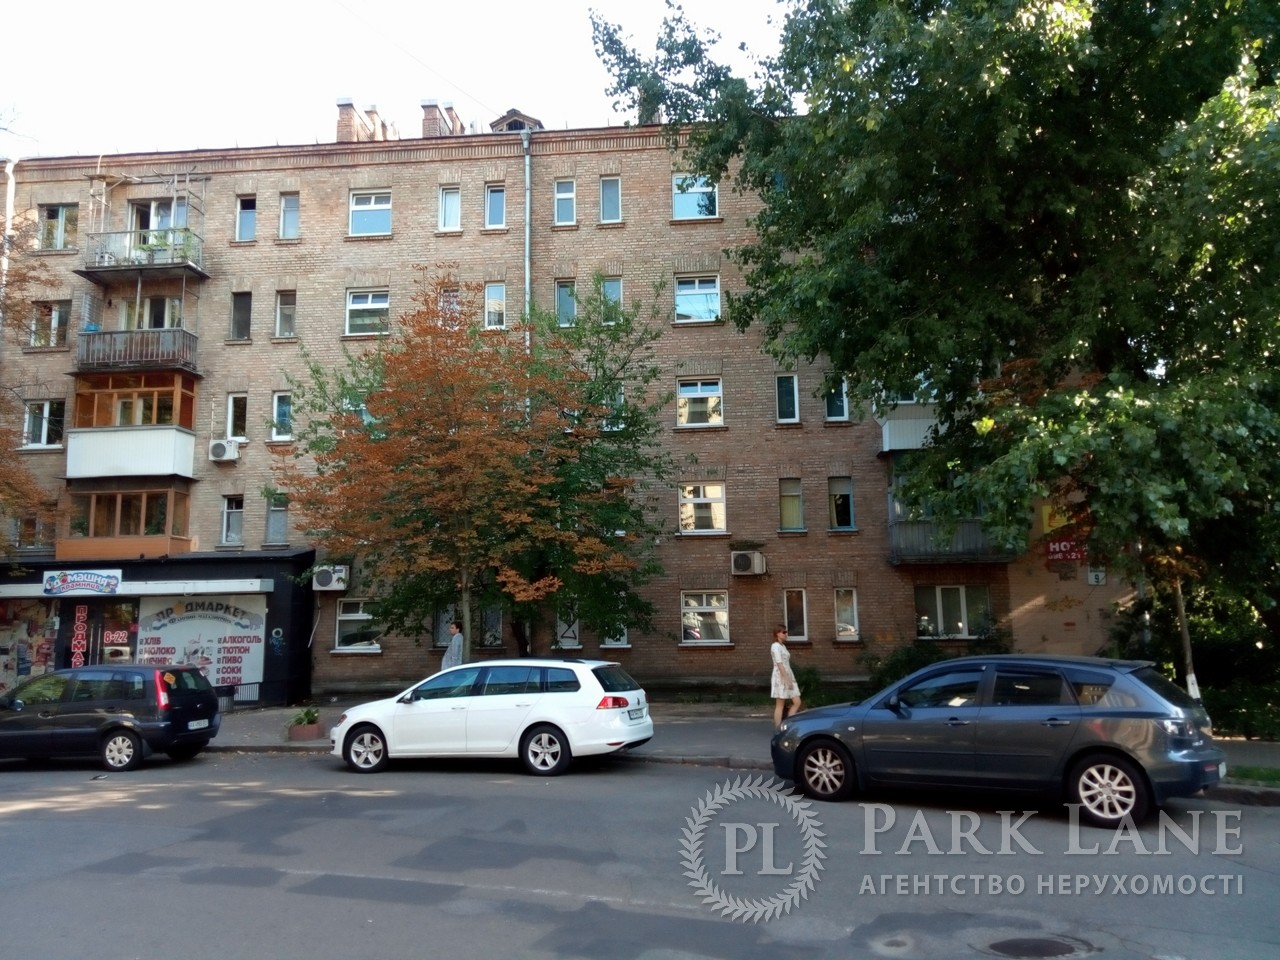 Салон краси, Z-230613, Цитадельна, Київ - Фото 14